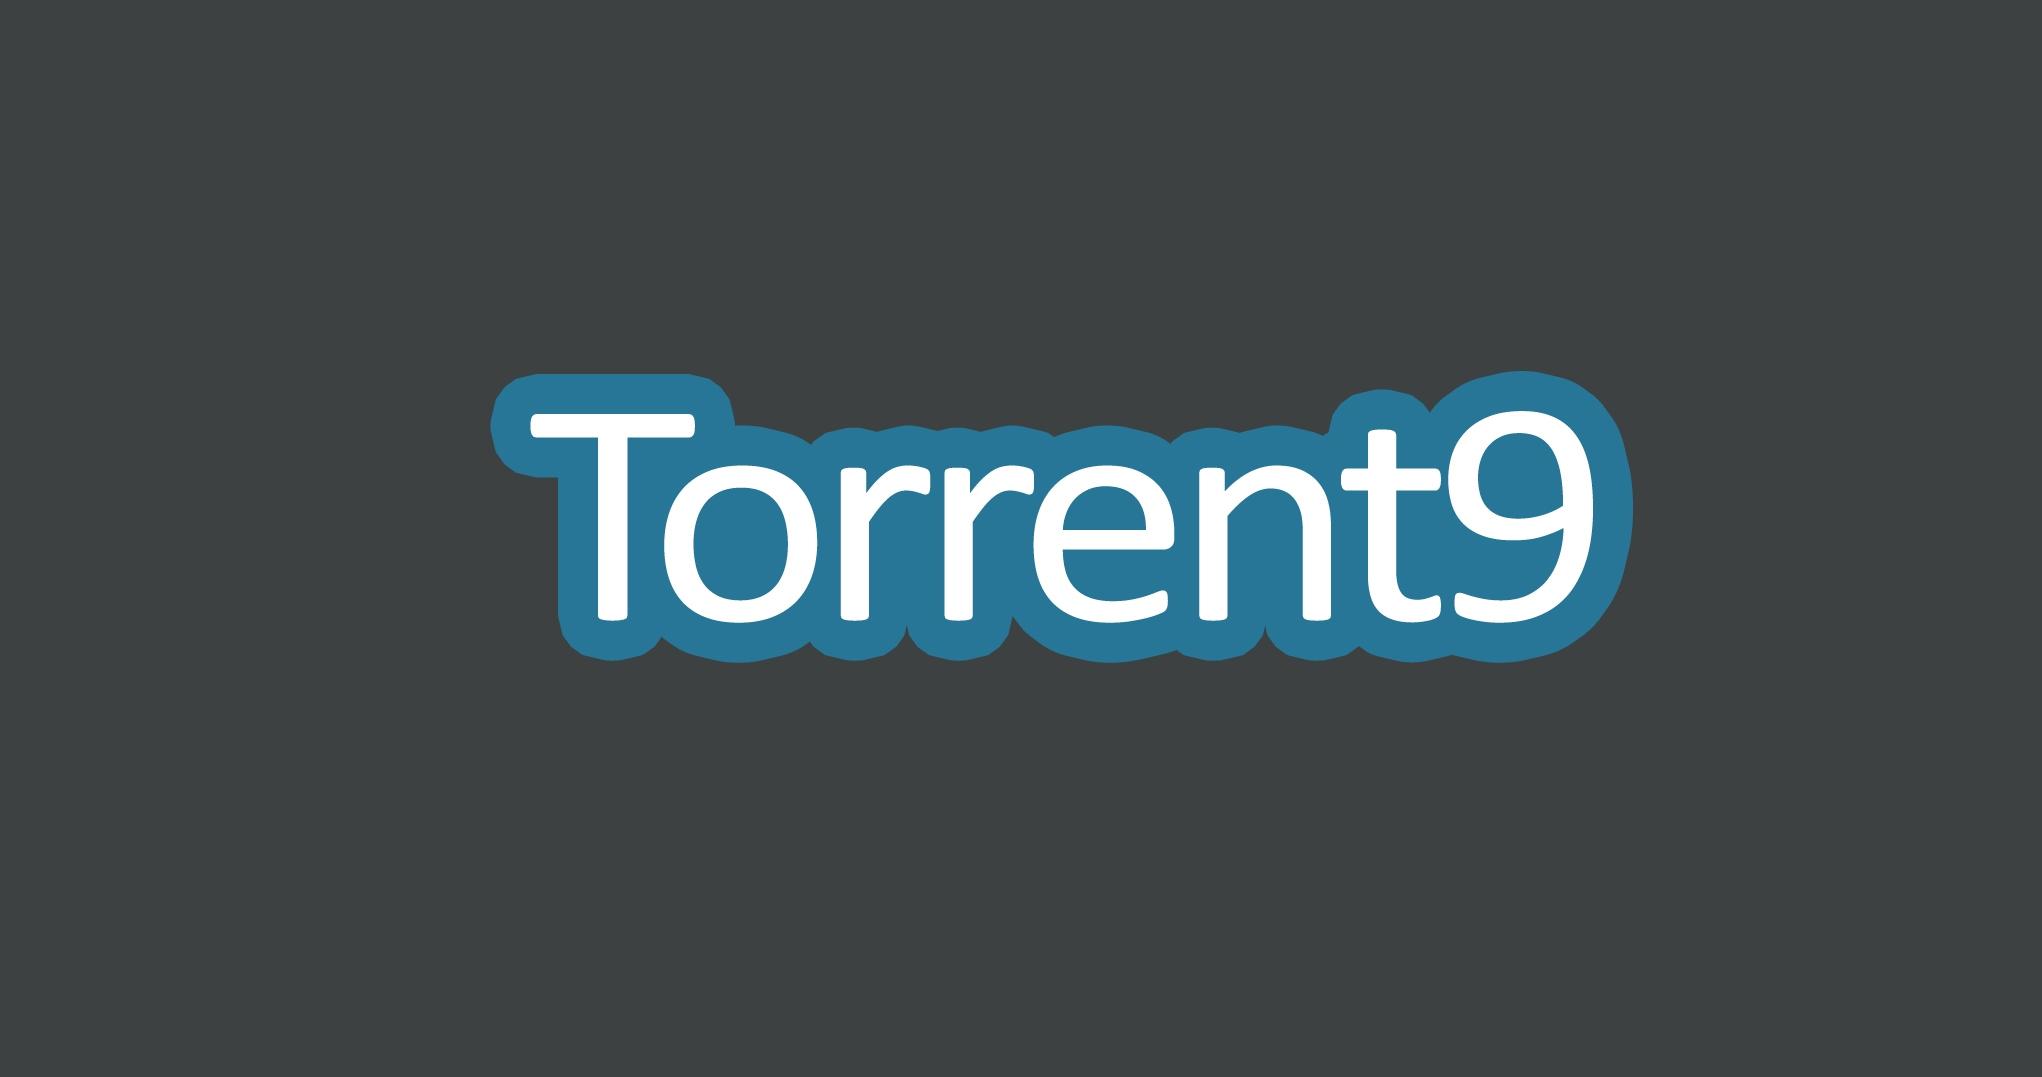 torrent9 ne fonctionne plus